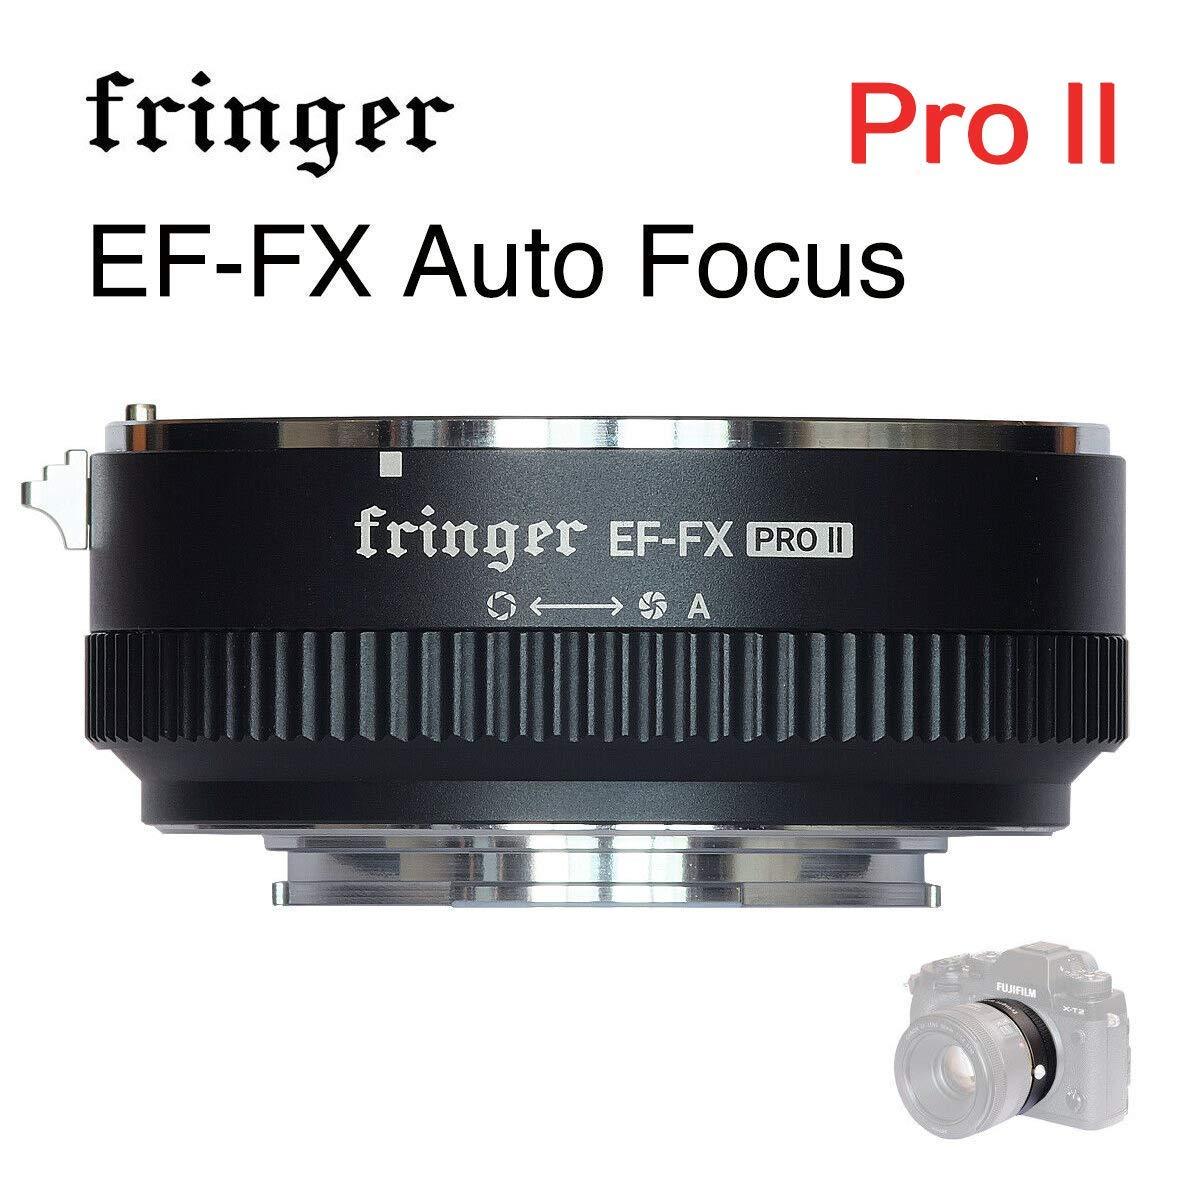 Fringer EF-FX PROバージョン オートフォーカスマウントアダプター 内蔵電子絞り器 Canon EF EOSレンズからFujifilm FX Mirroless Camera X-E3 XT20 X-Pro2 X-T2 X-A X-E1 X-M1 XT1 XPRO2用   B07K76R832